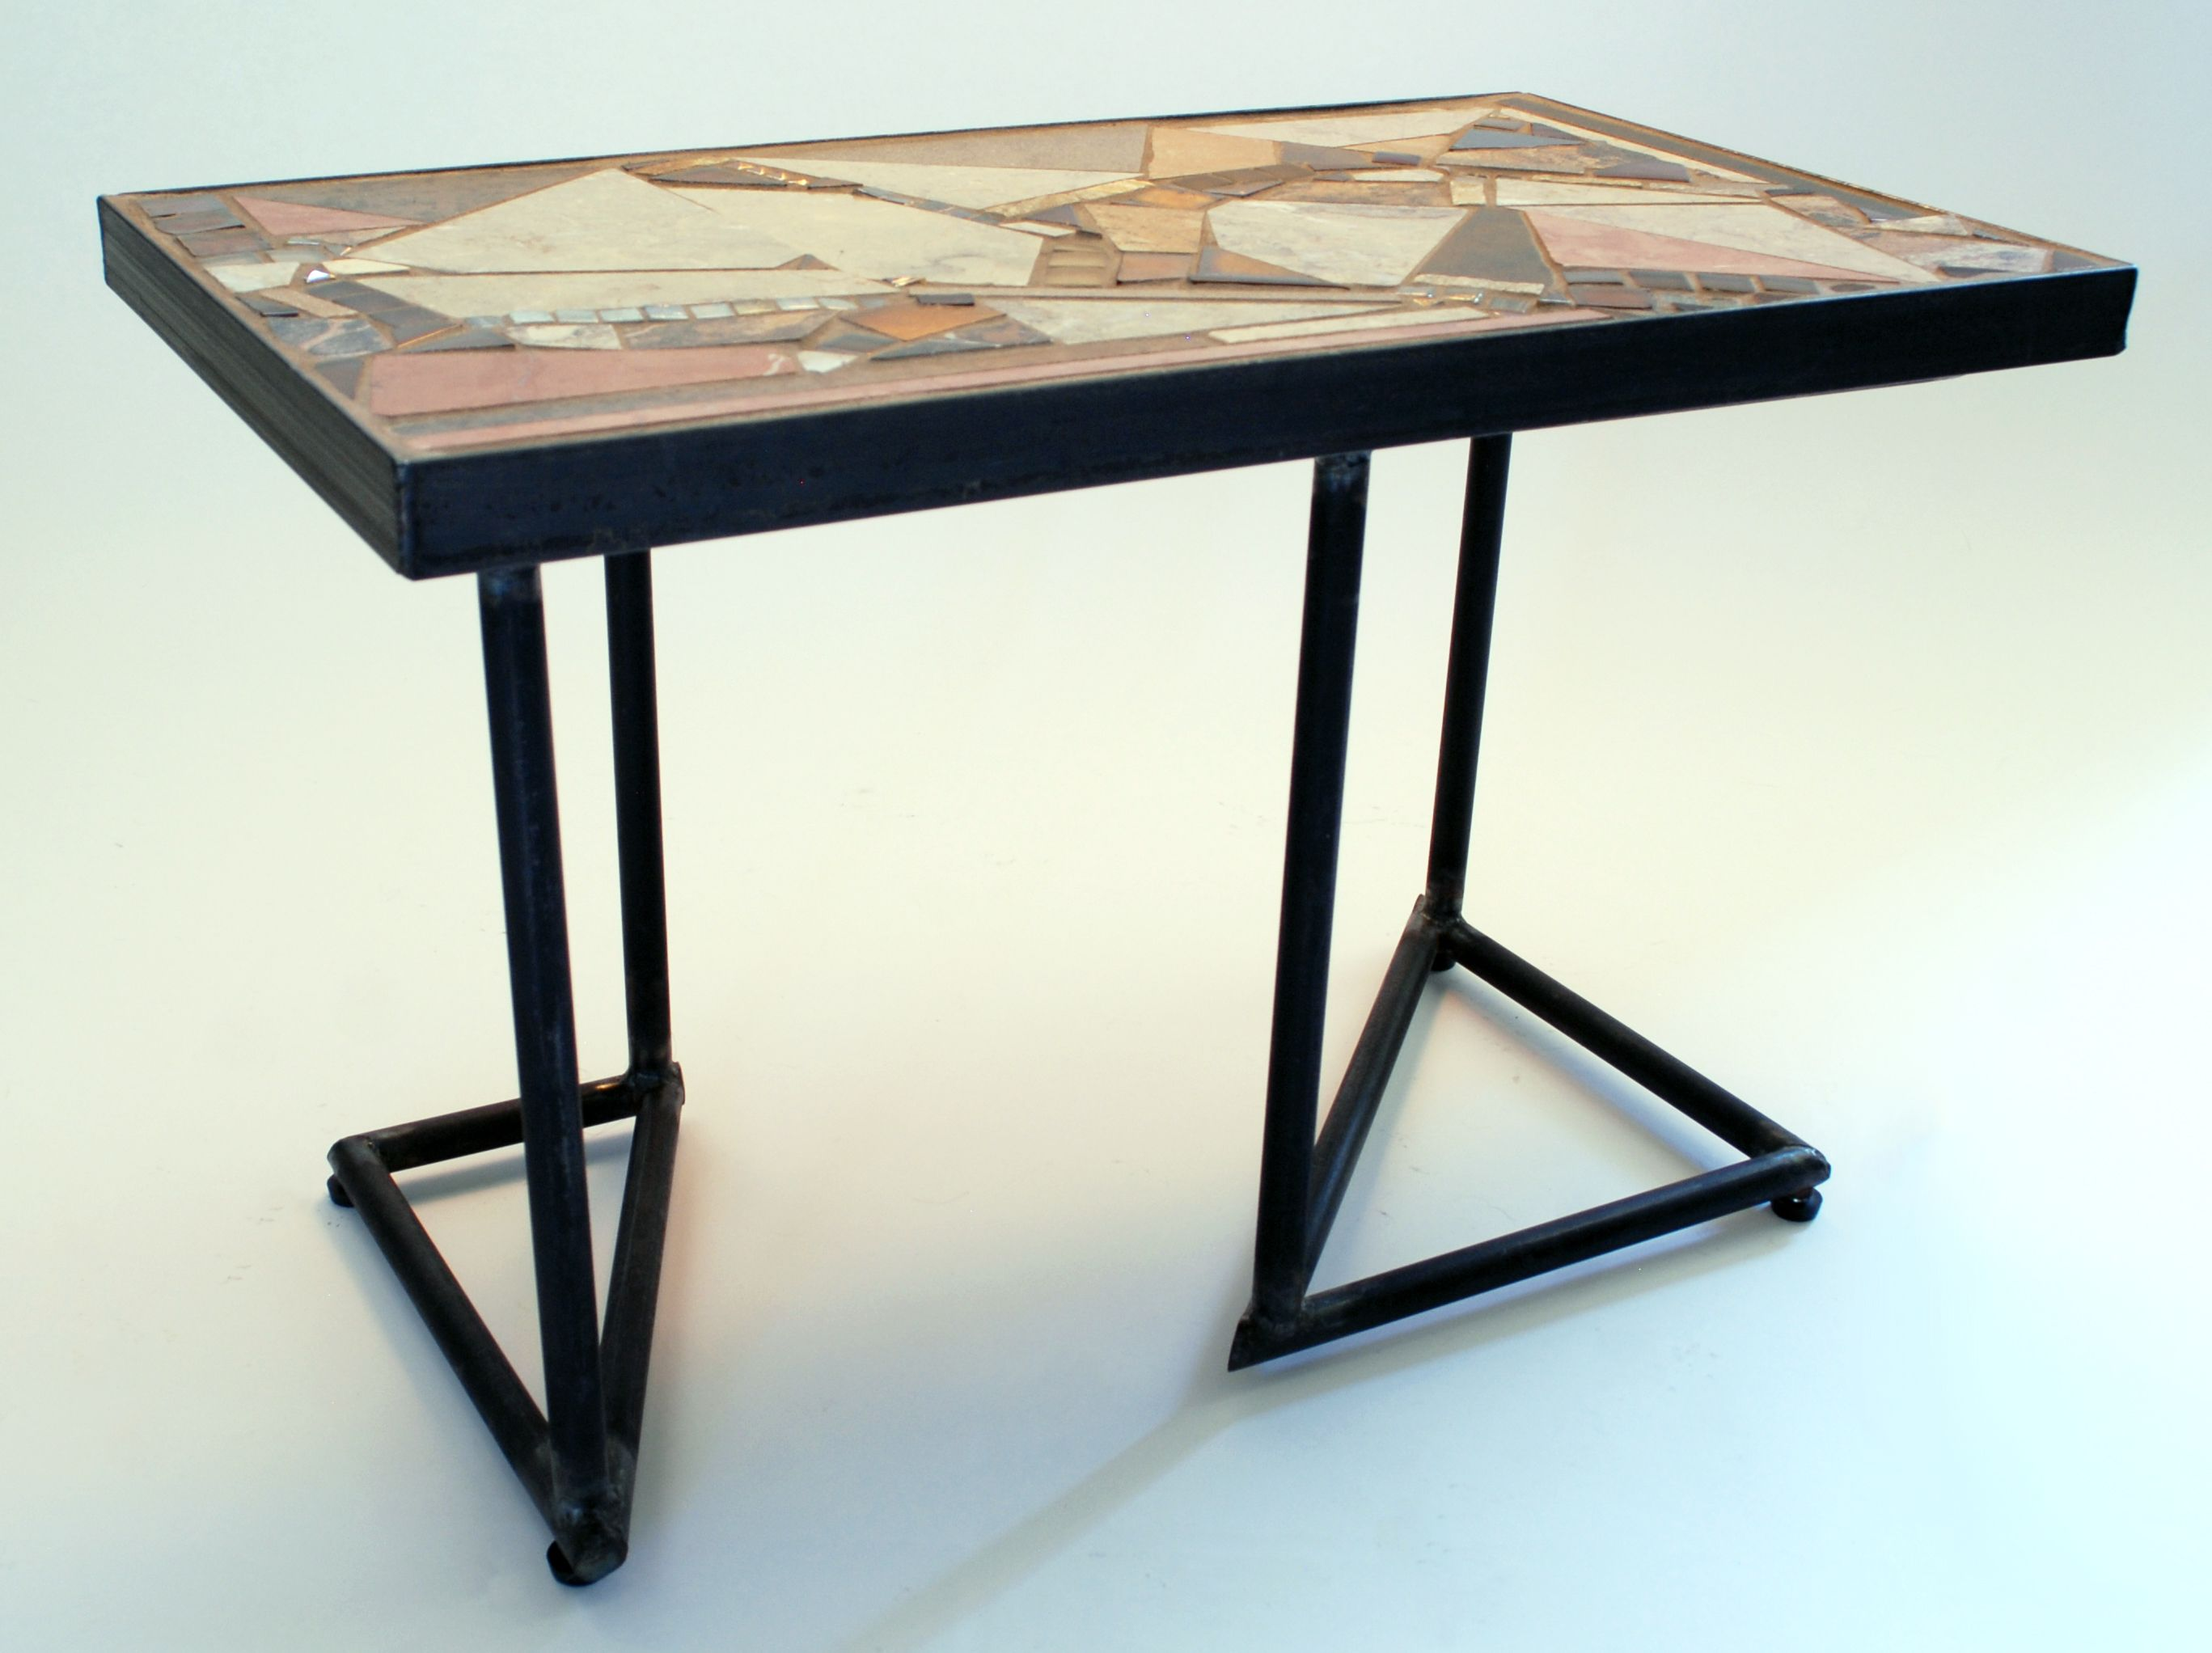 Sonora Slant Bespoke Table By Jsz Id Furniture Mosaic Furniture Bespoke Furniture [ 2044 x 2735 Pixel ]